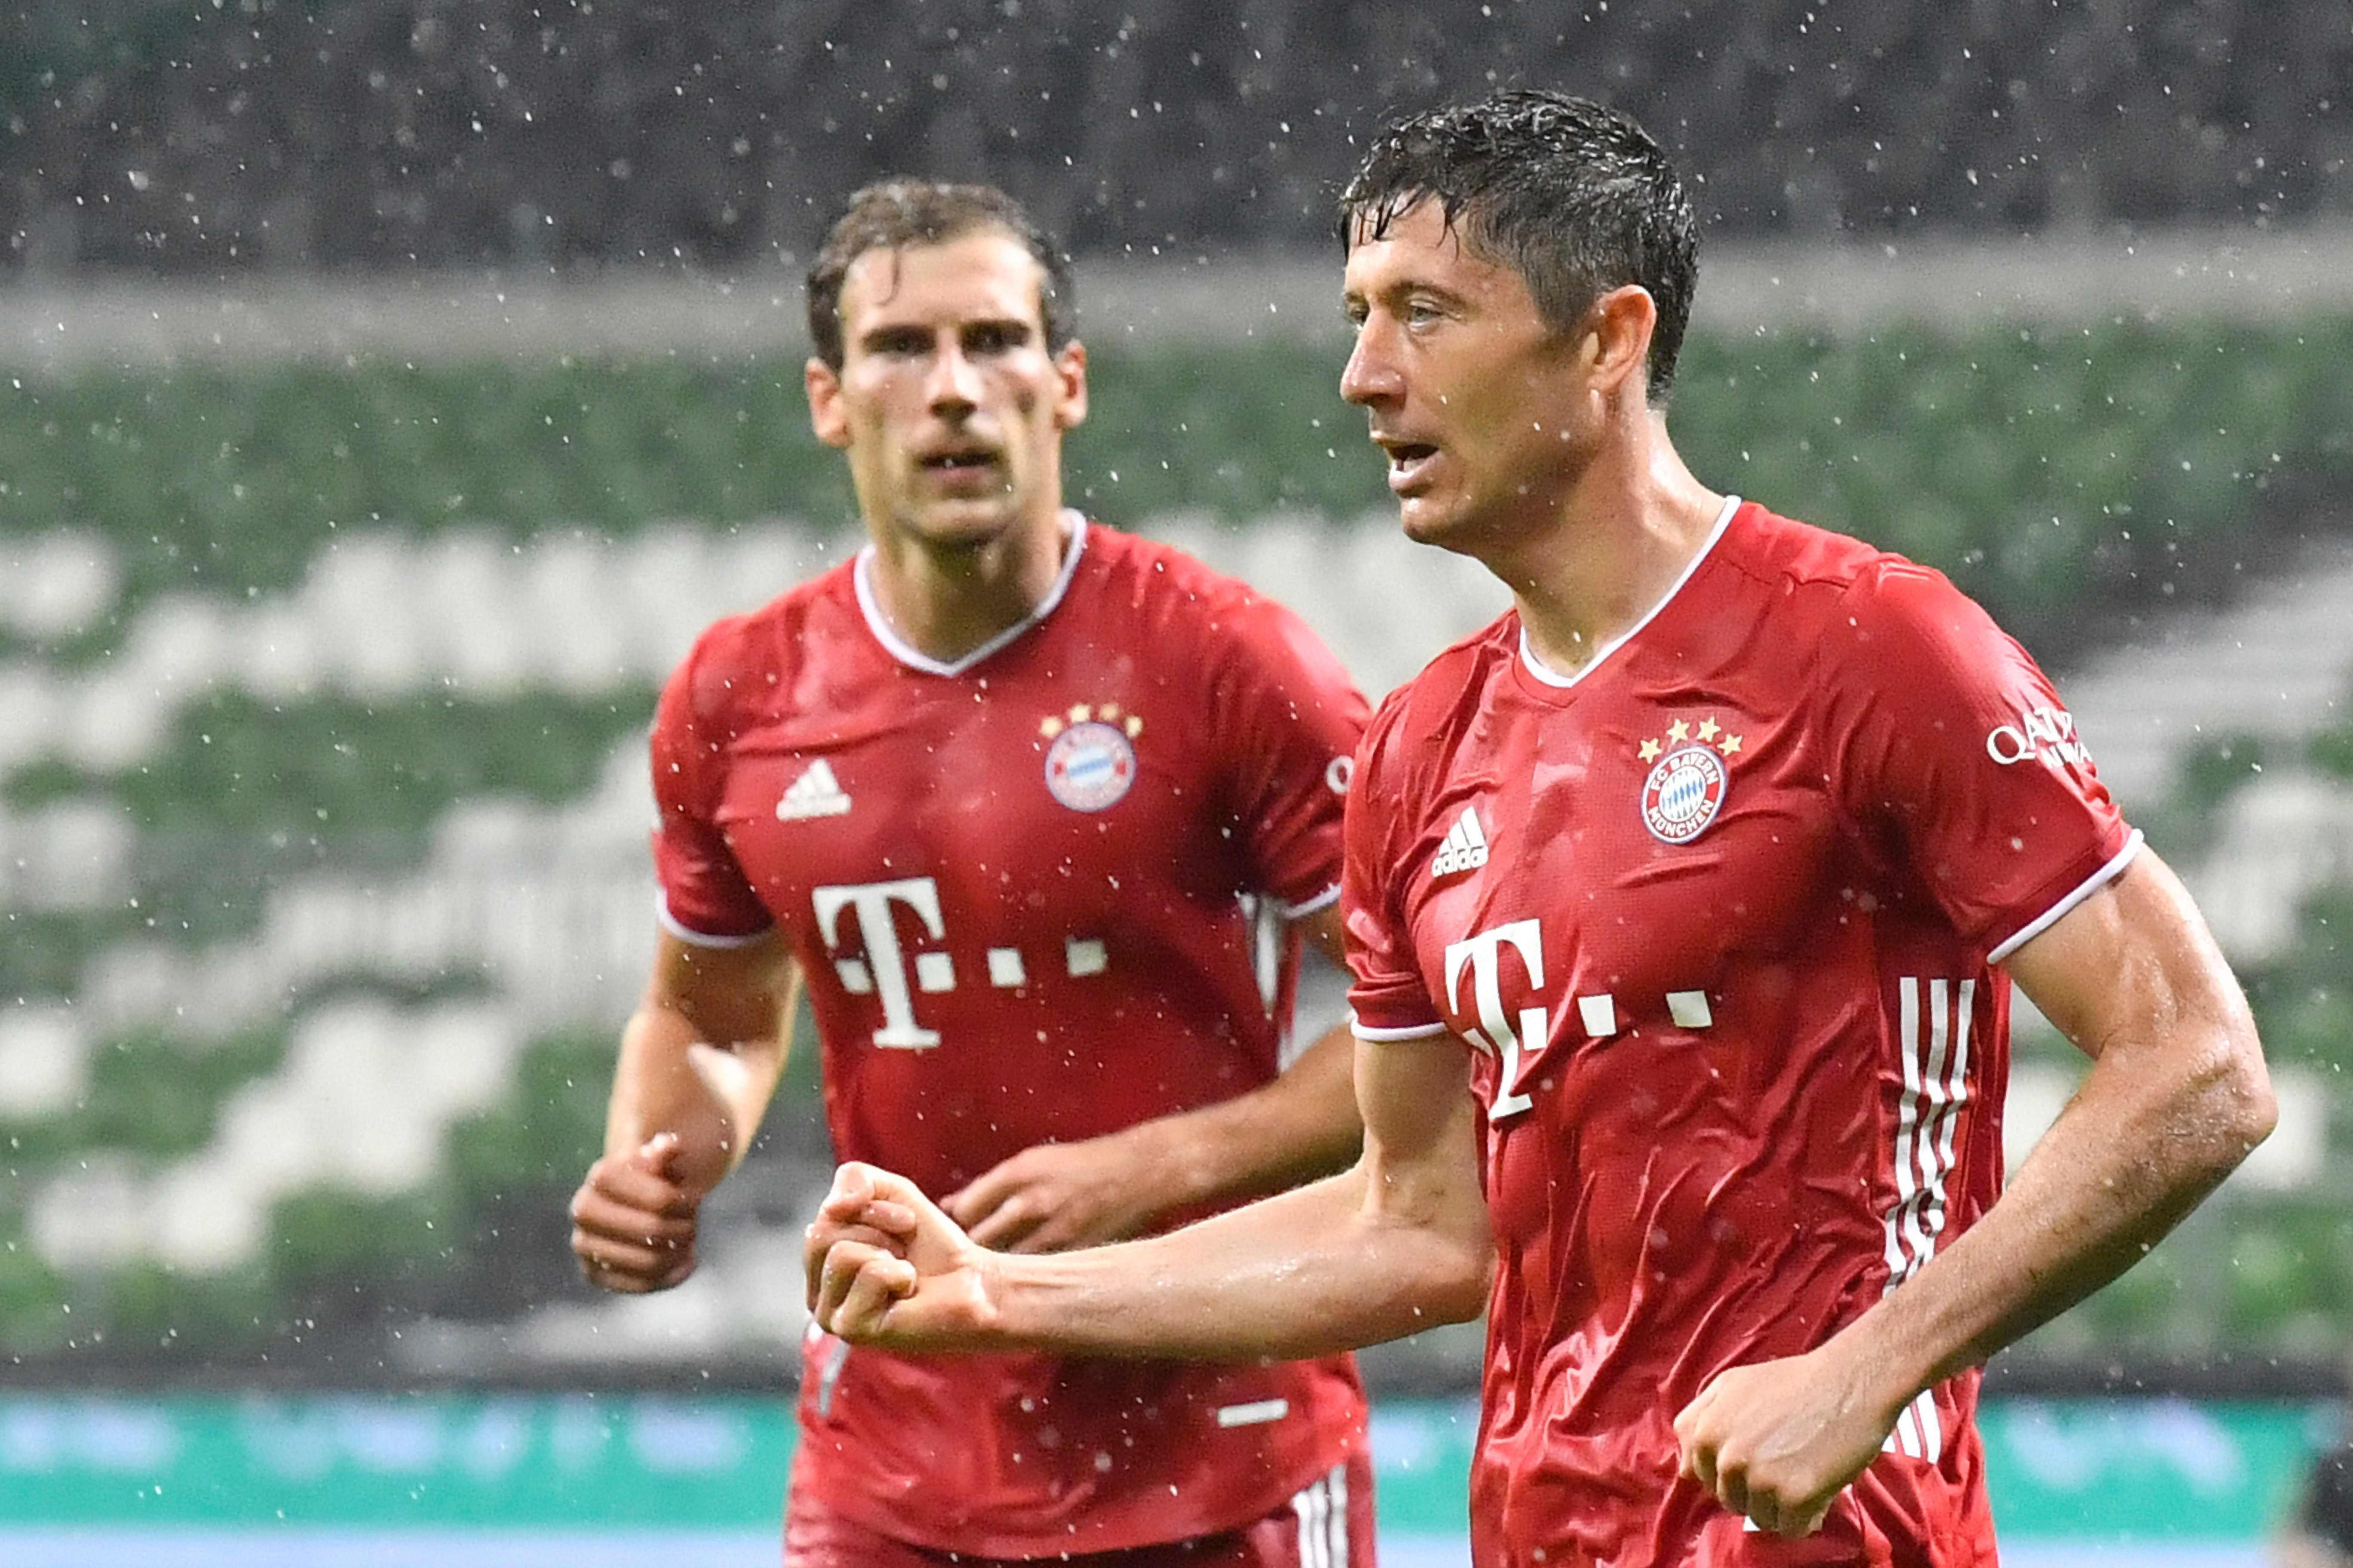 Bayern Munich win EIGHTH straight Bundesliga title as Robert Lewandowski goal seals victory at Werder Bremen thumbnail